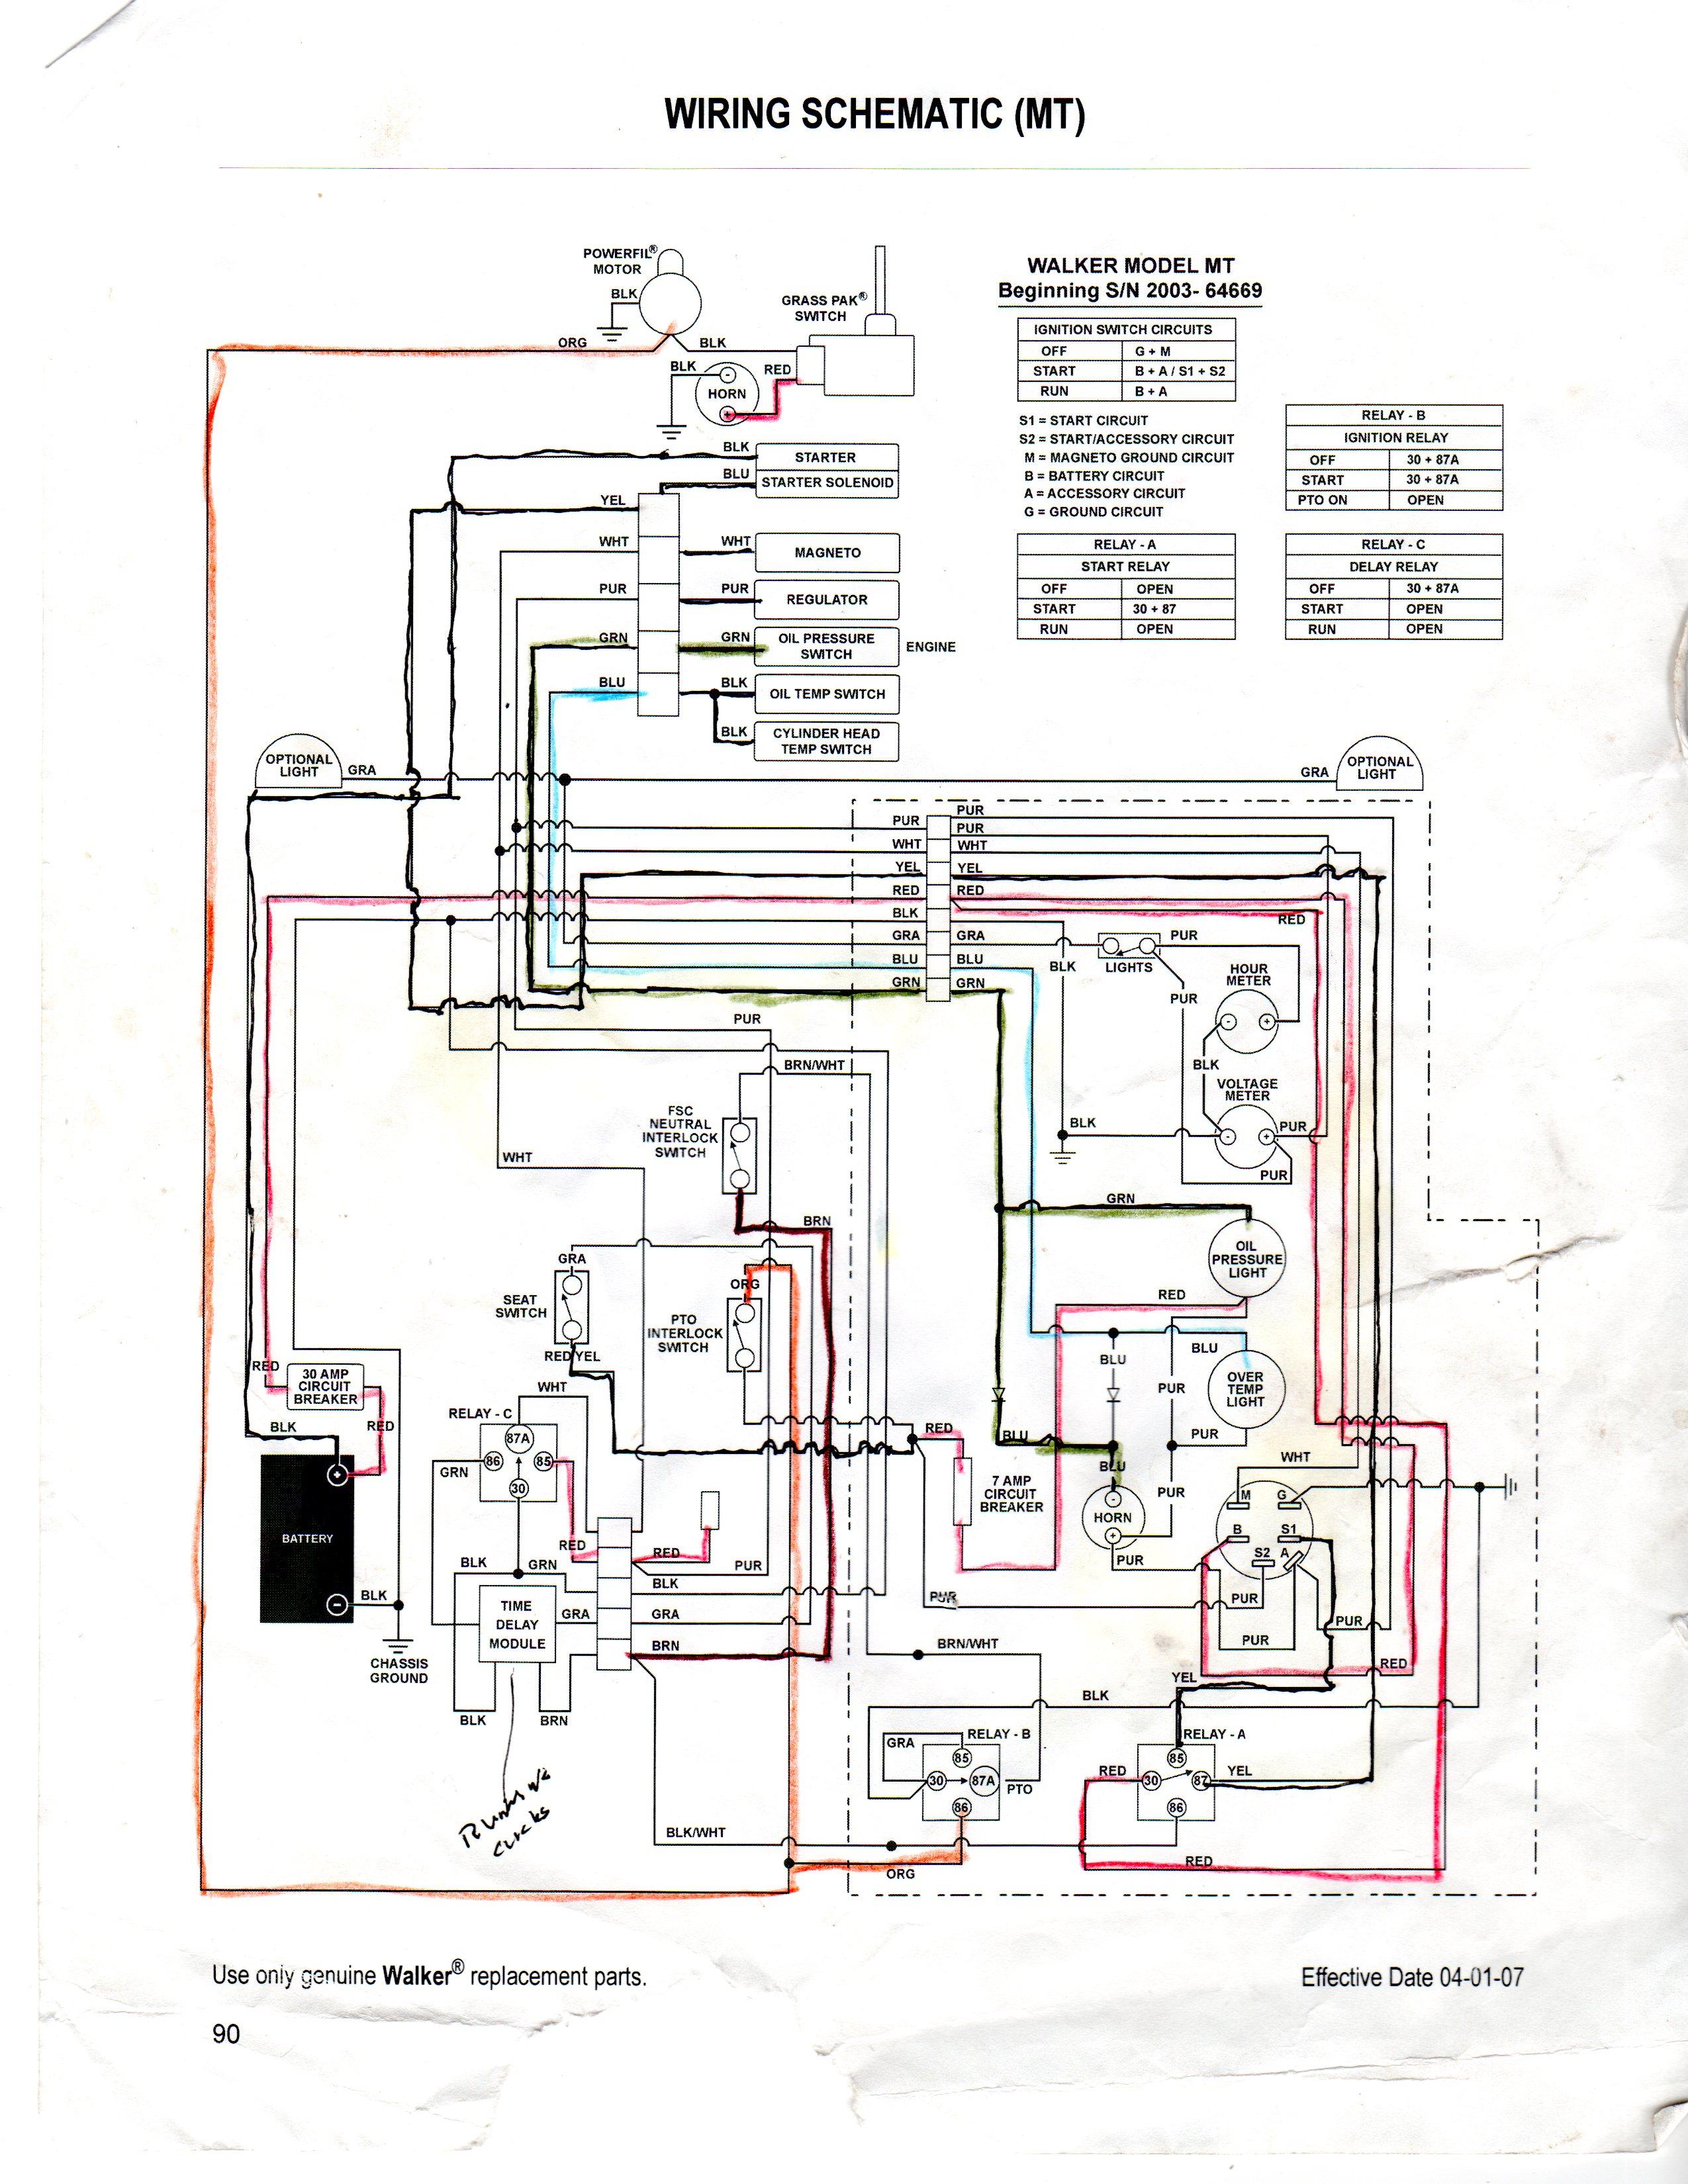 6e01b Wiring Diagram For Cub Cadet Ltx 1046 Wiring Resources